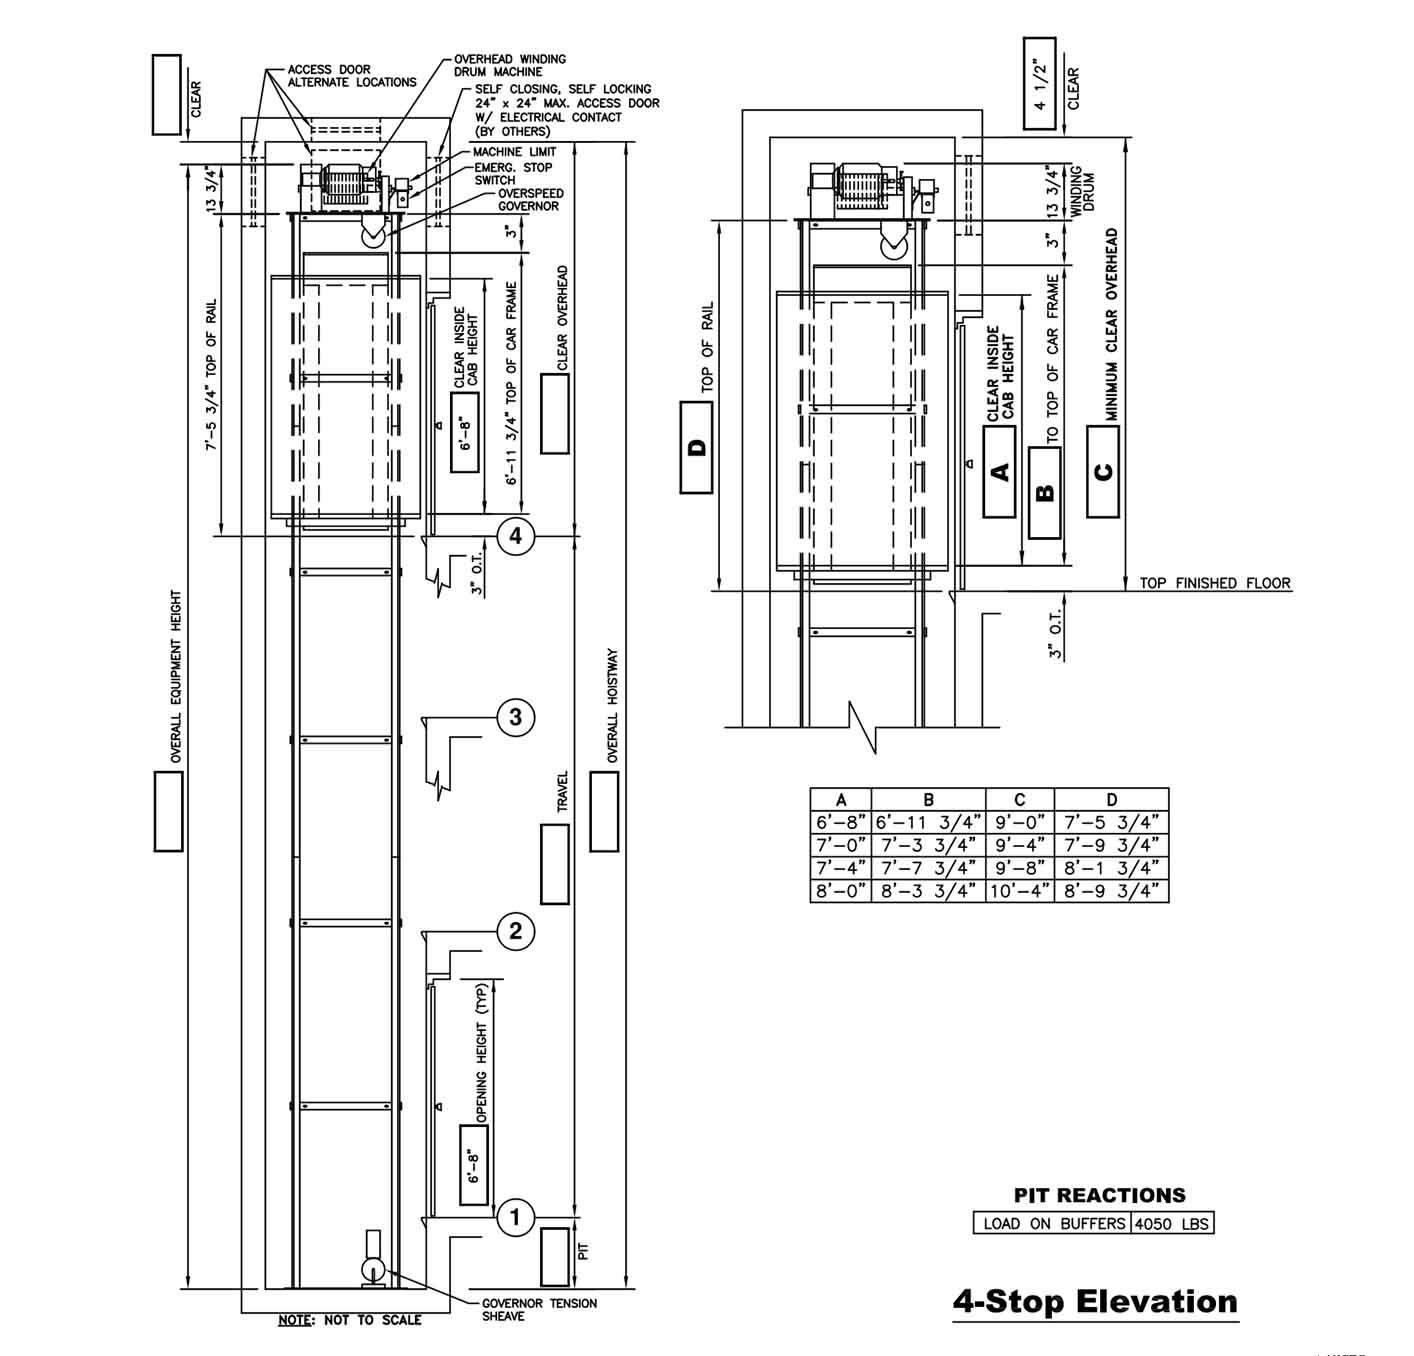 cable drive drawings custom elevator elevator house elevation roronoa zoro crossword  [ 1414 x 1356 Pixel ]